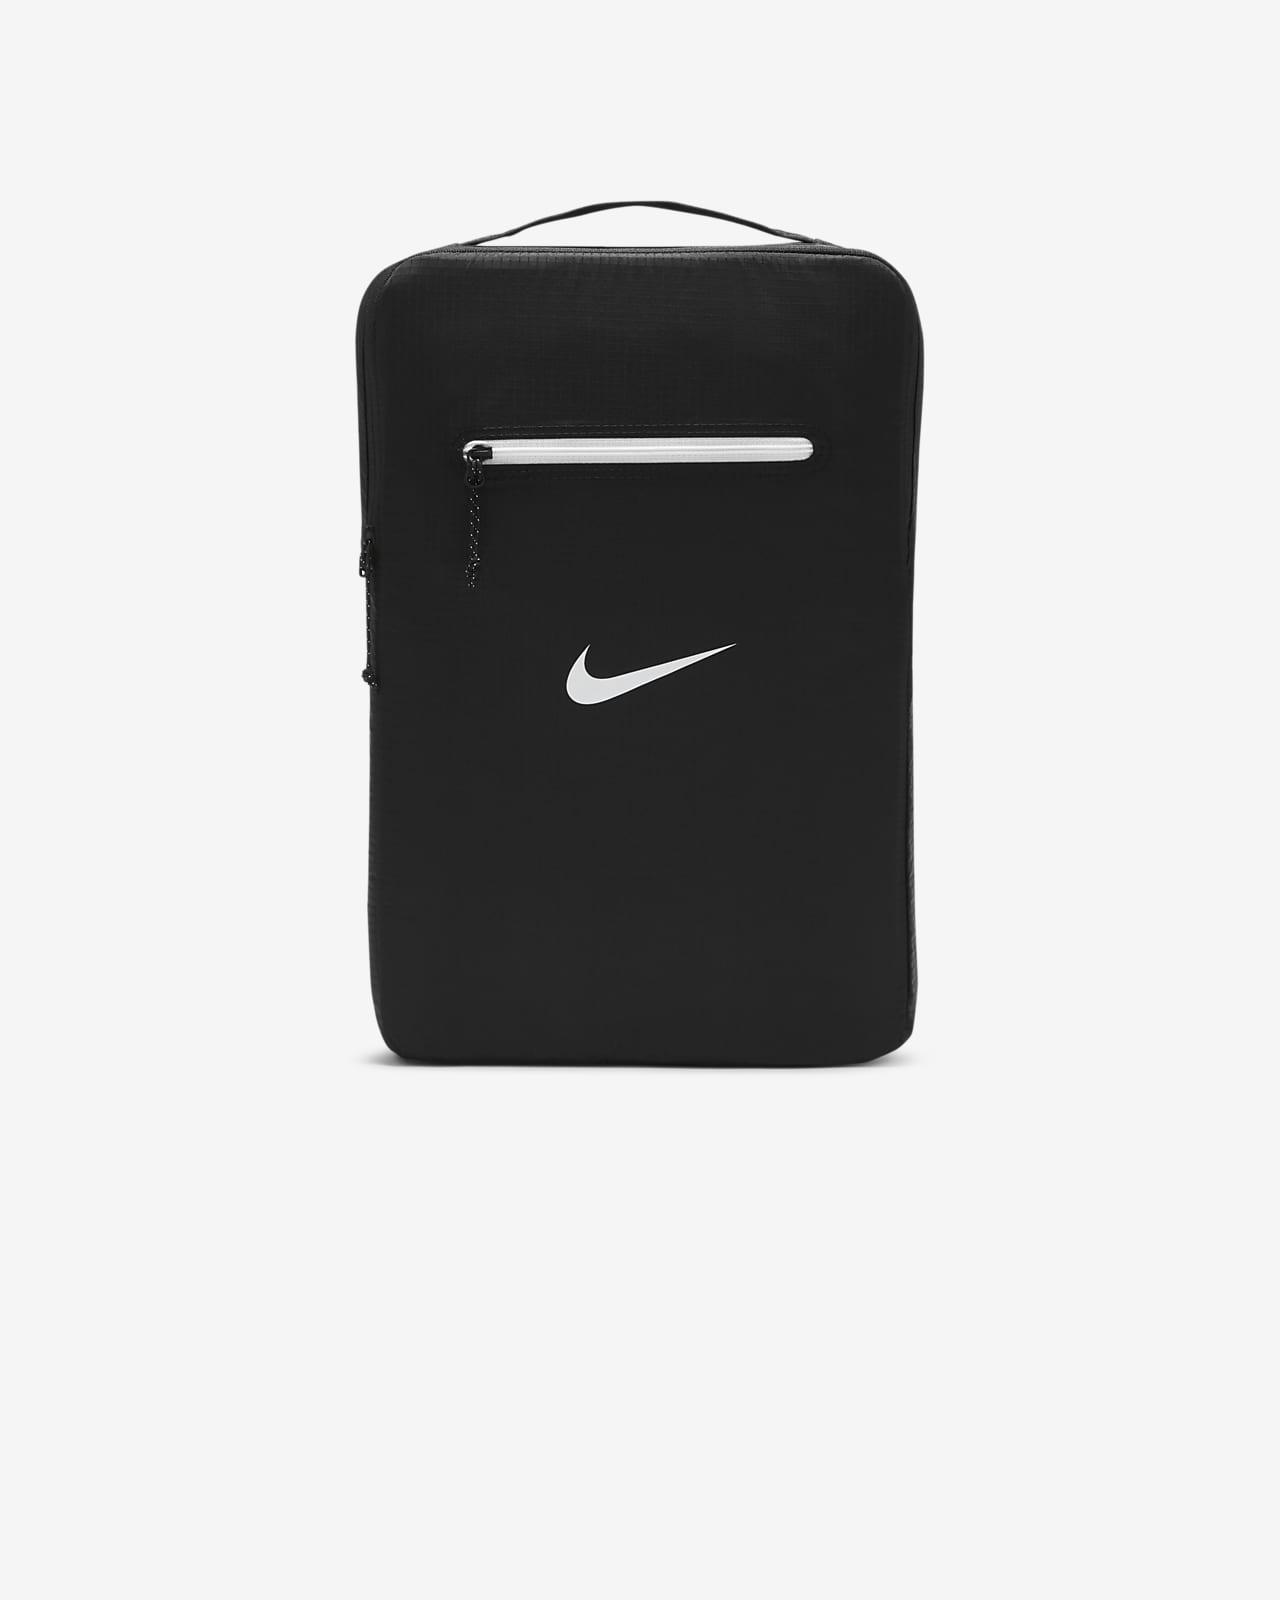 Borsa portascarpe Nike